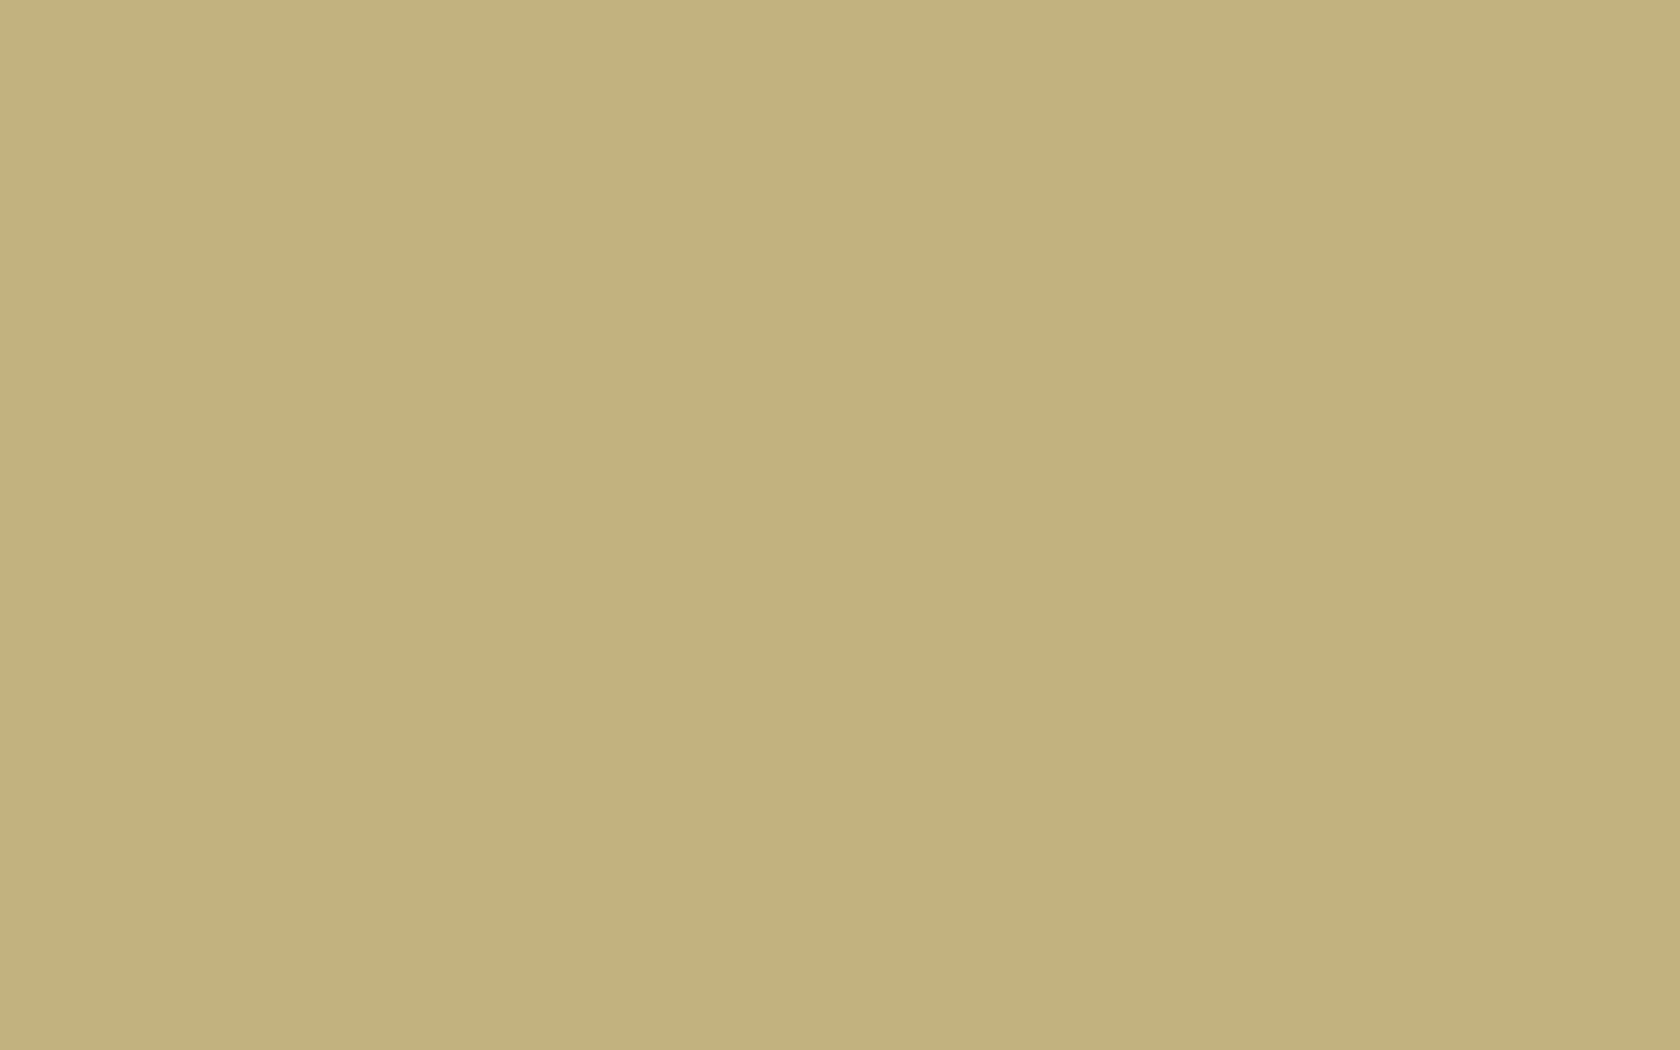 1680x1050 Ecru Solid Color Background